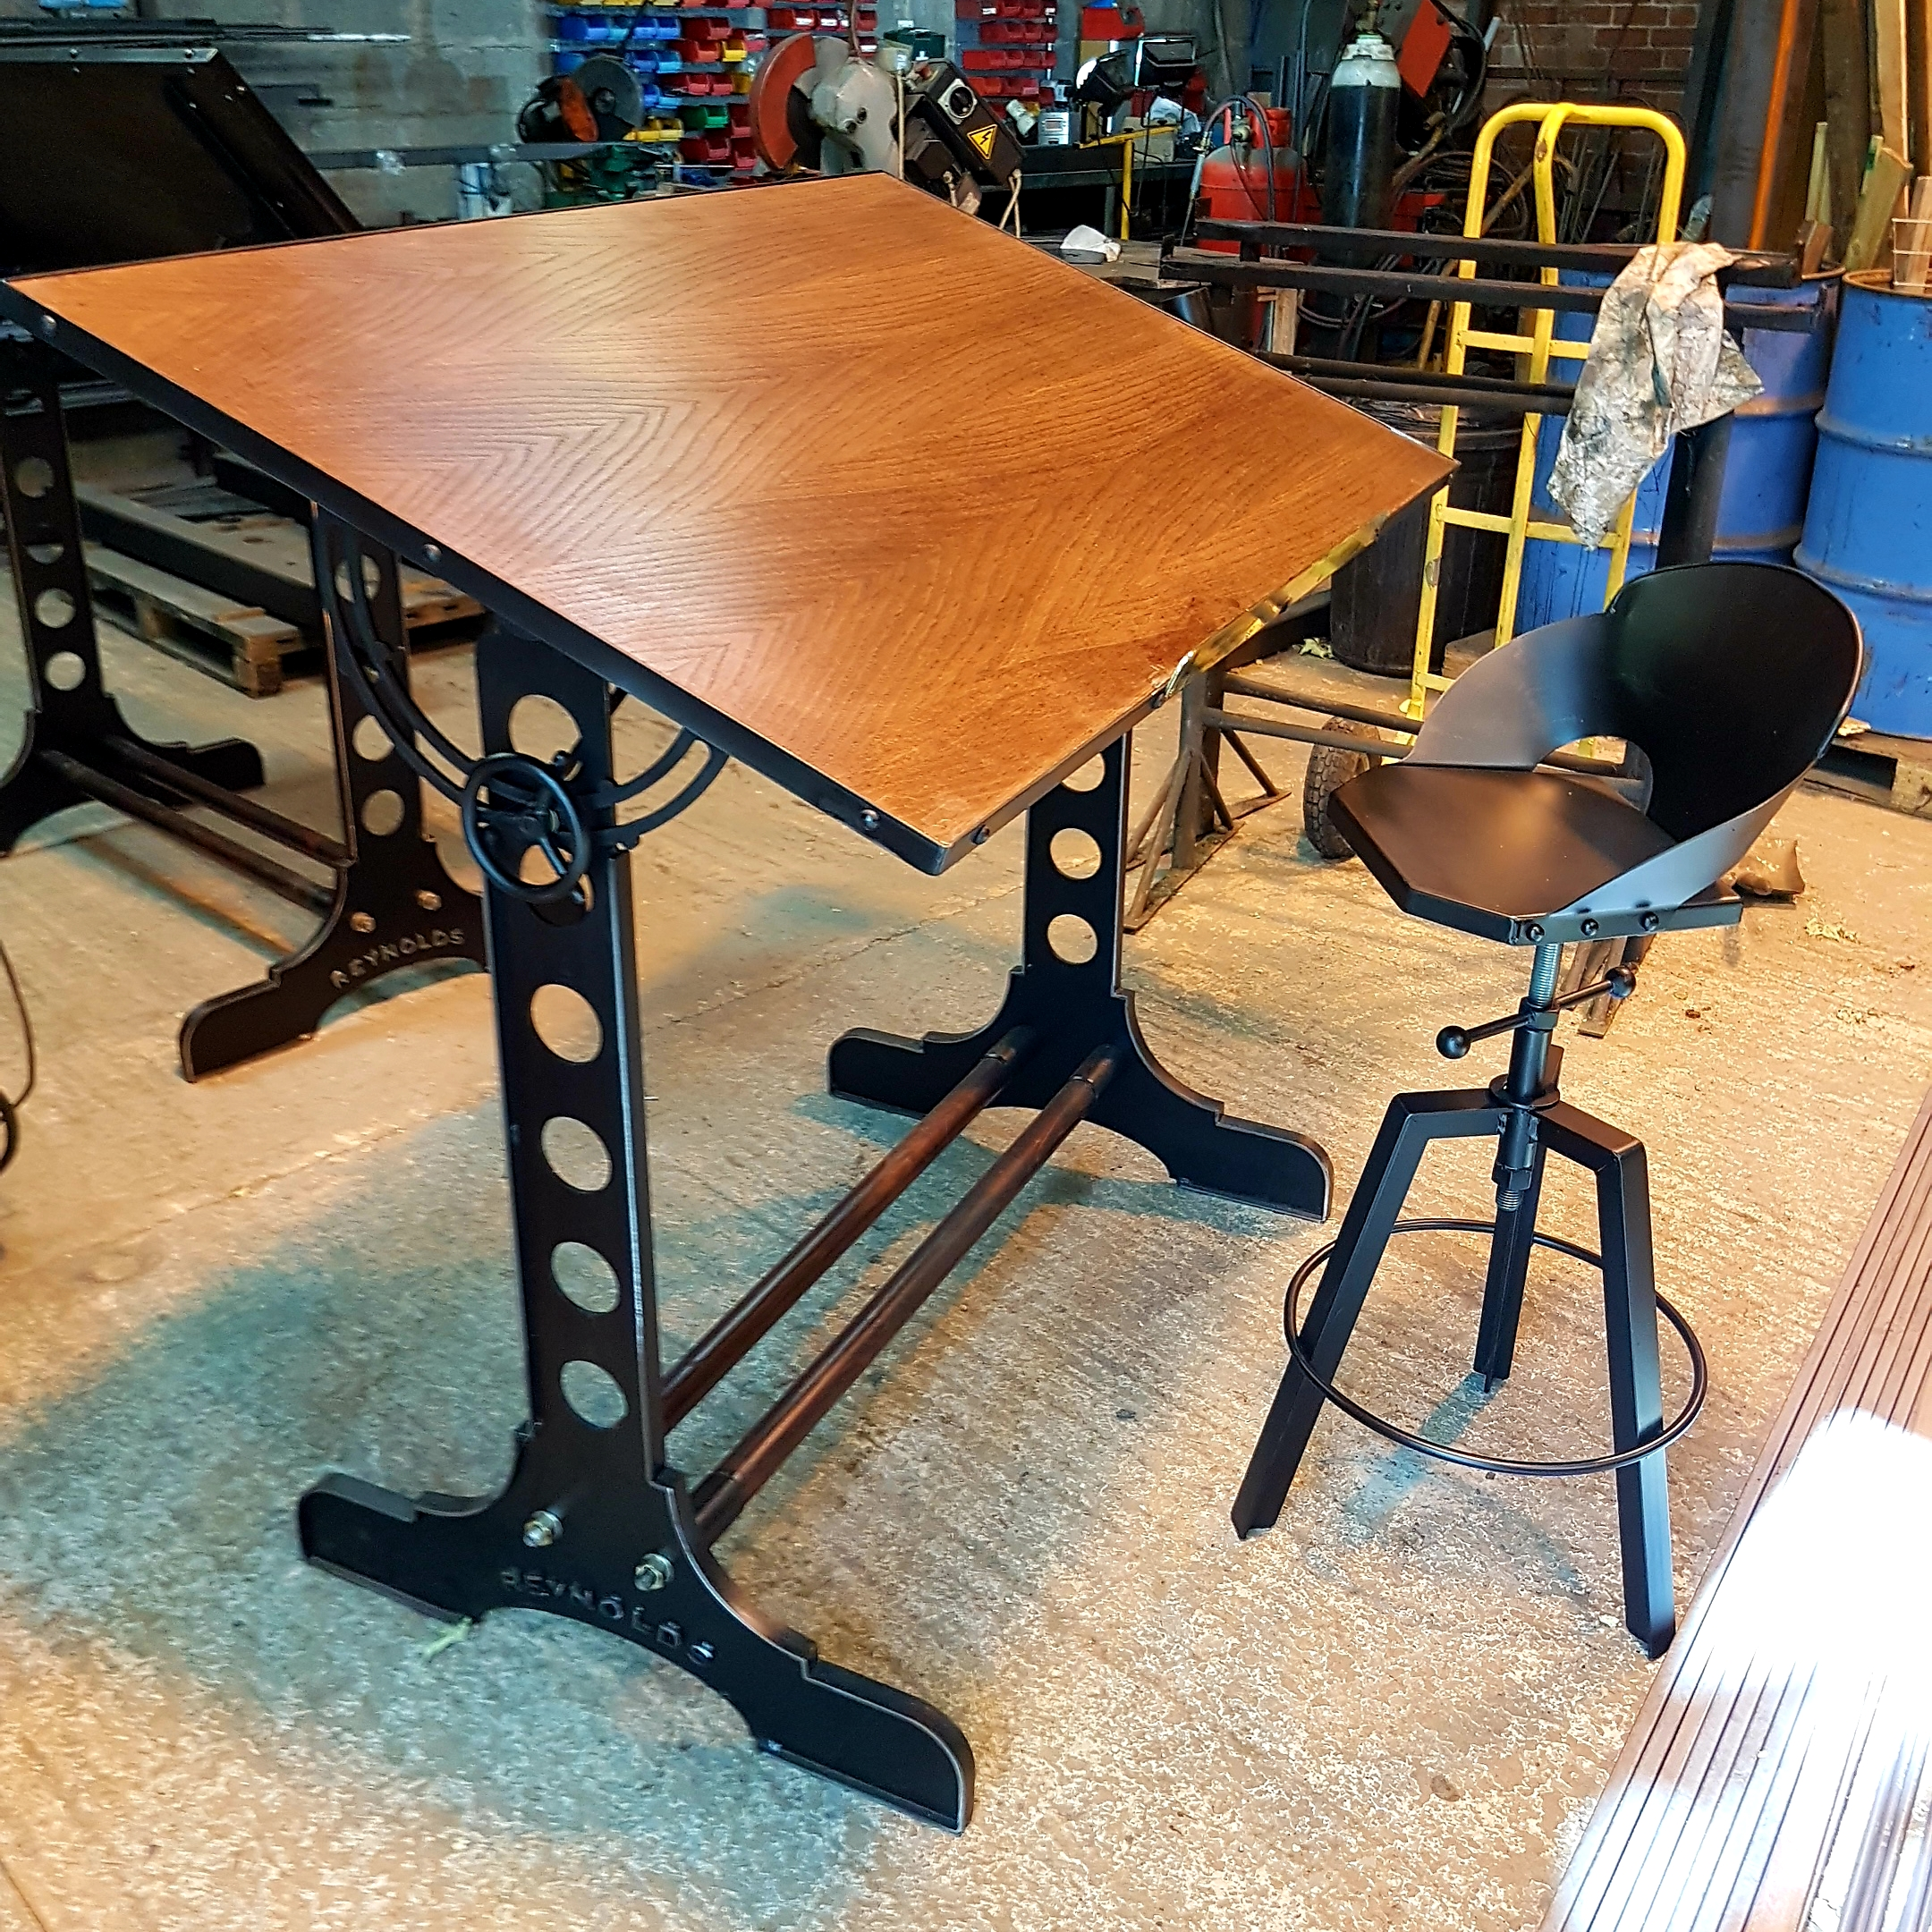 Retro desk or drafting table